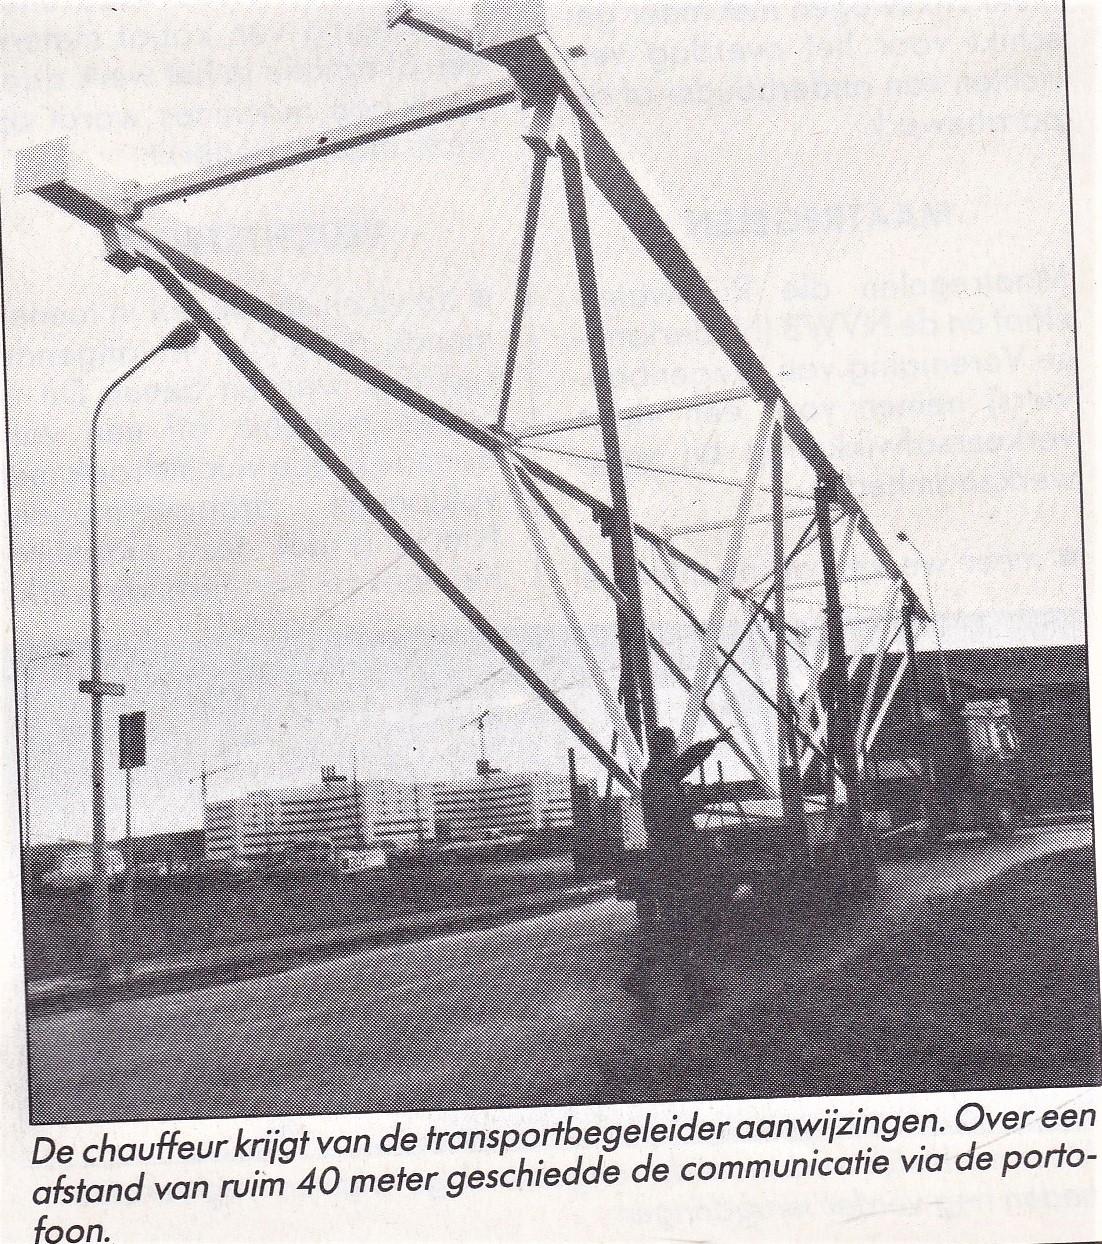 Transpo-Nuth--1988[995]